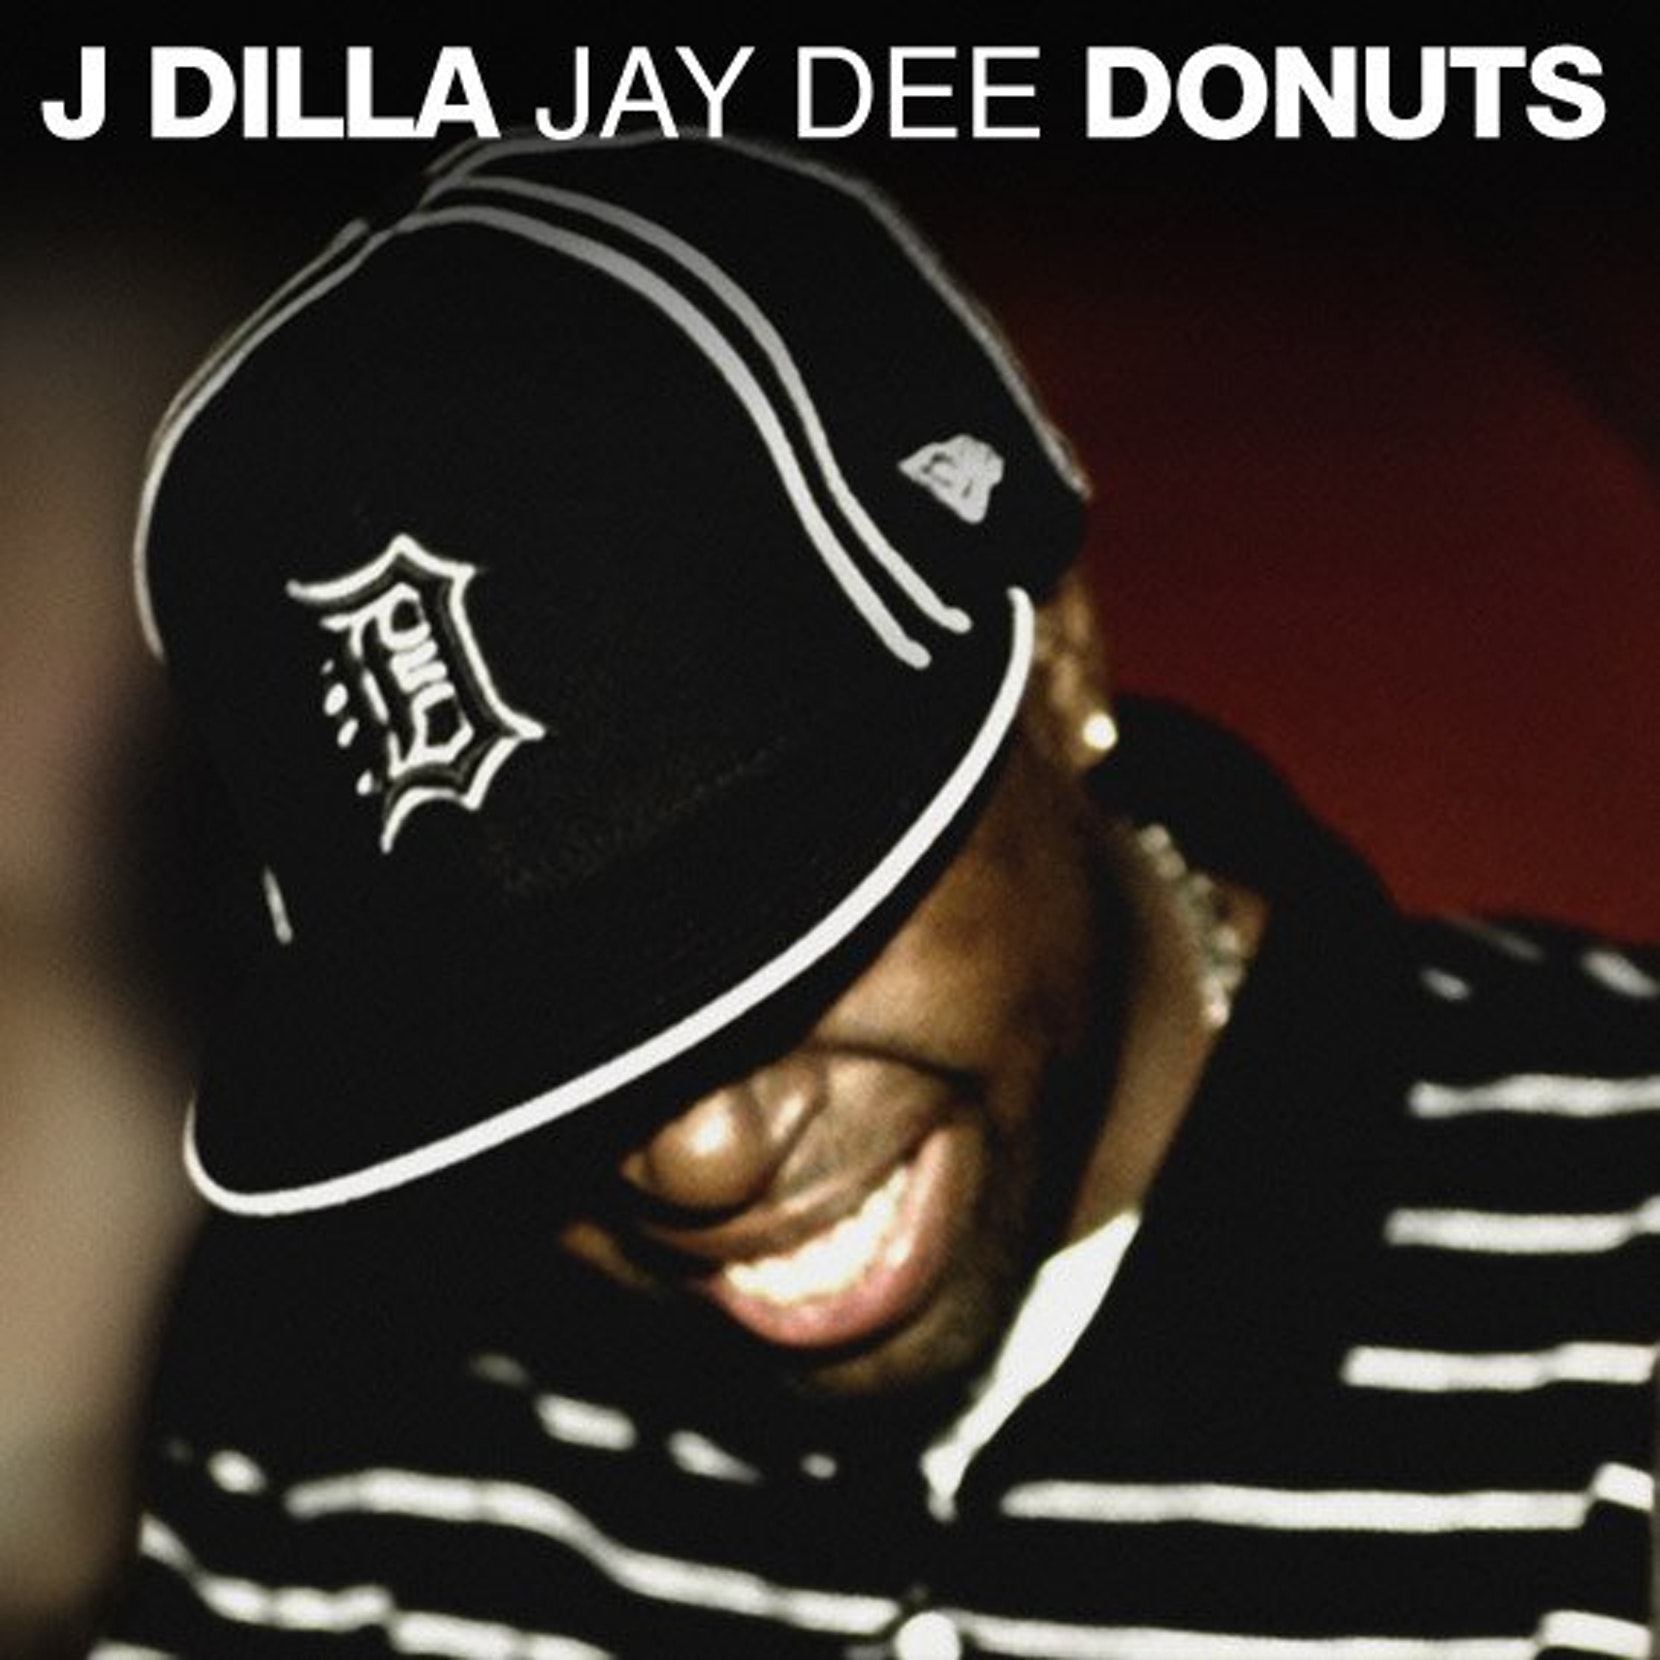 The 10 Best Instrumental Hip-Hop Albums To Own On Vinyl